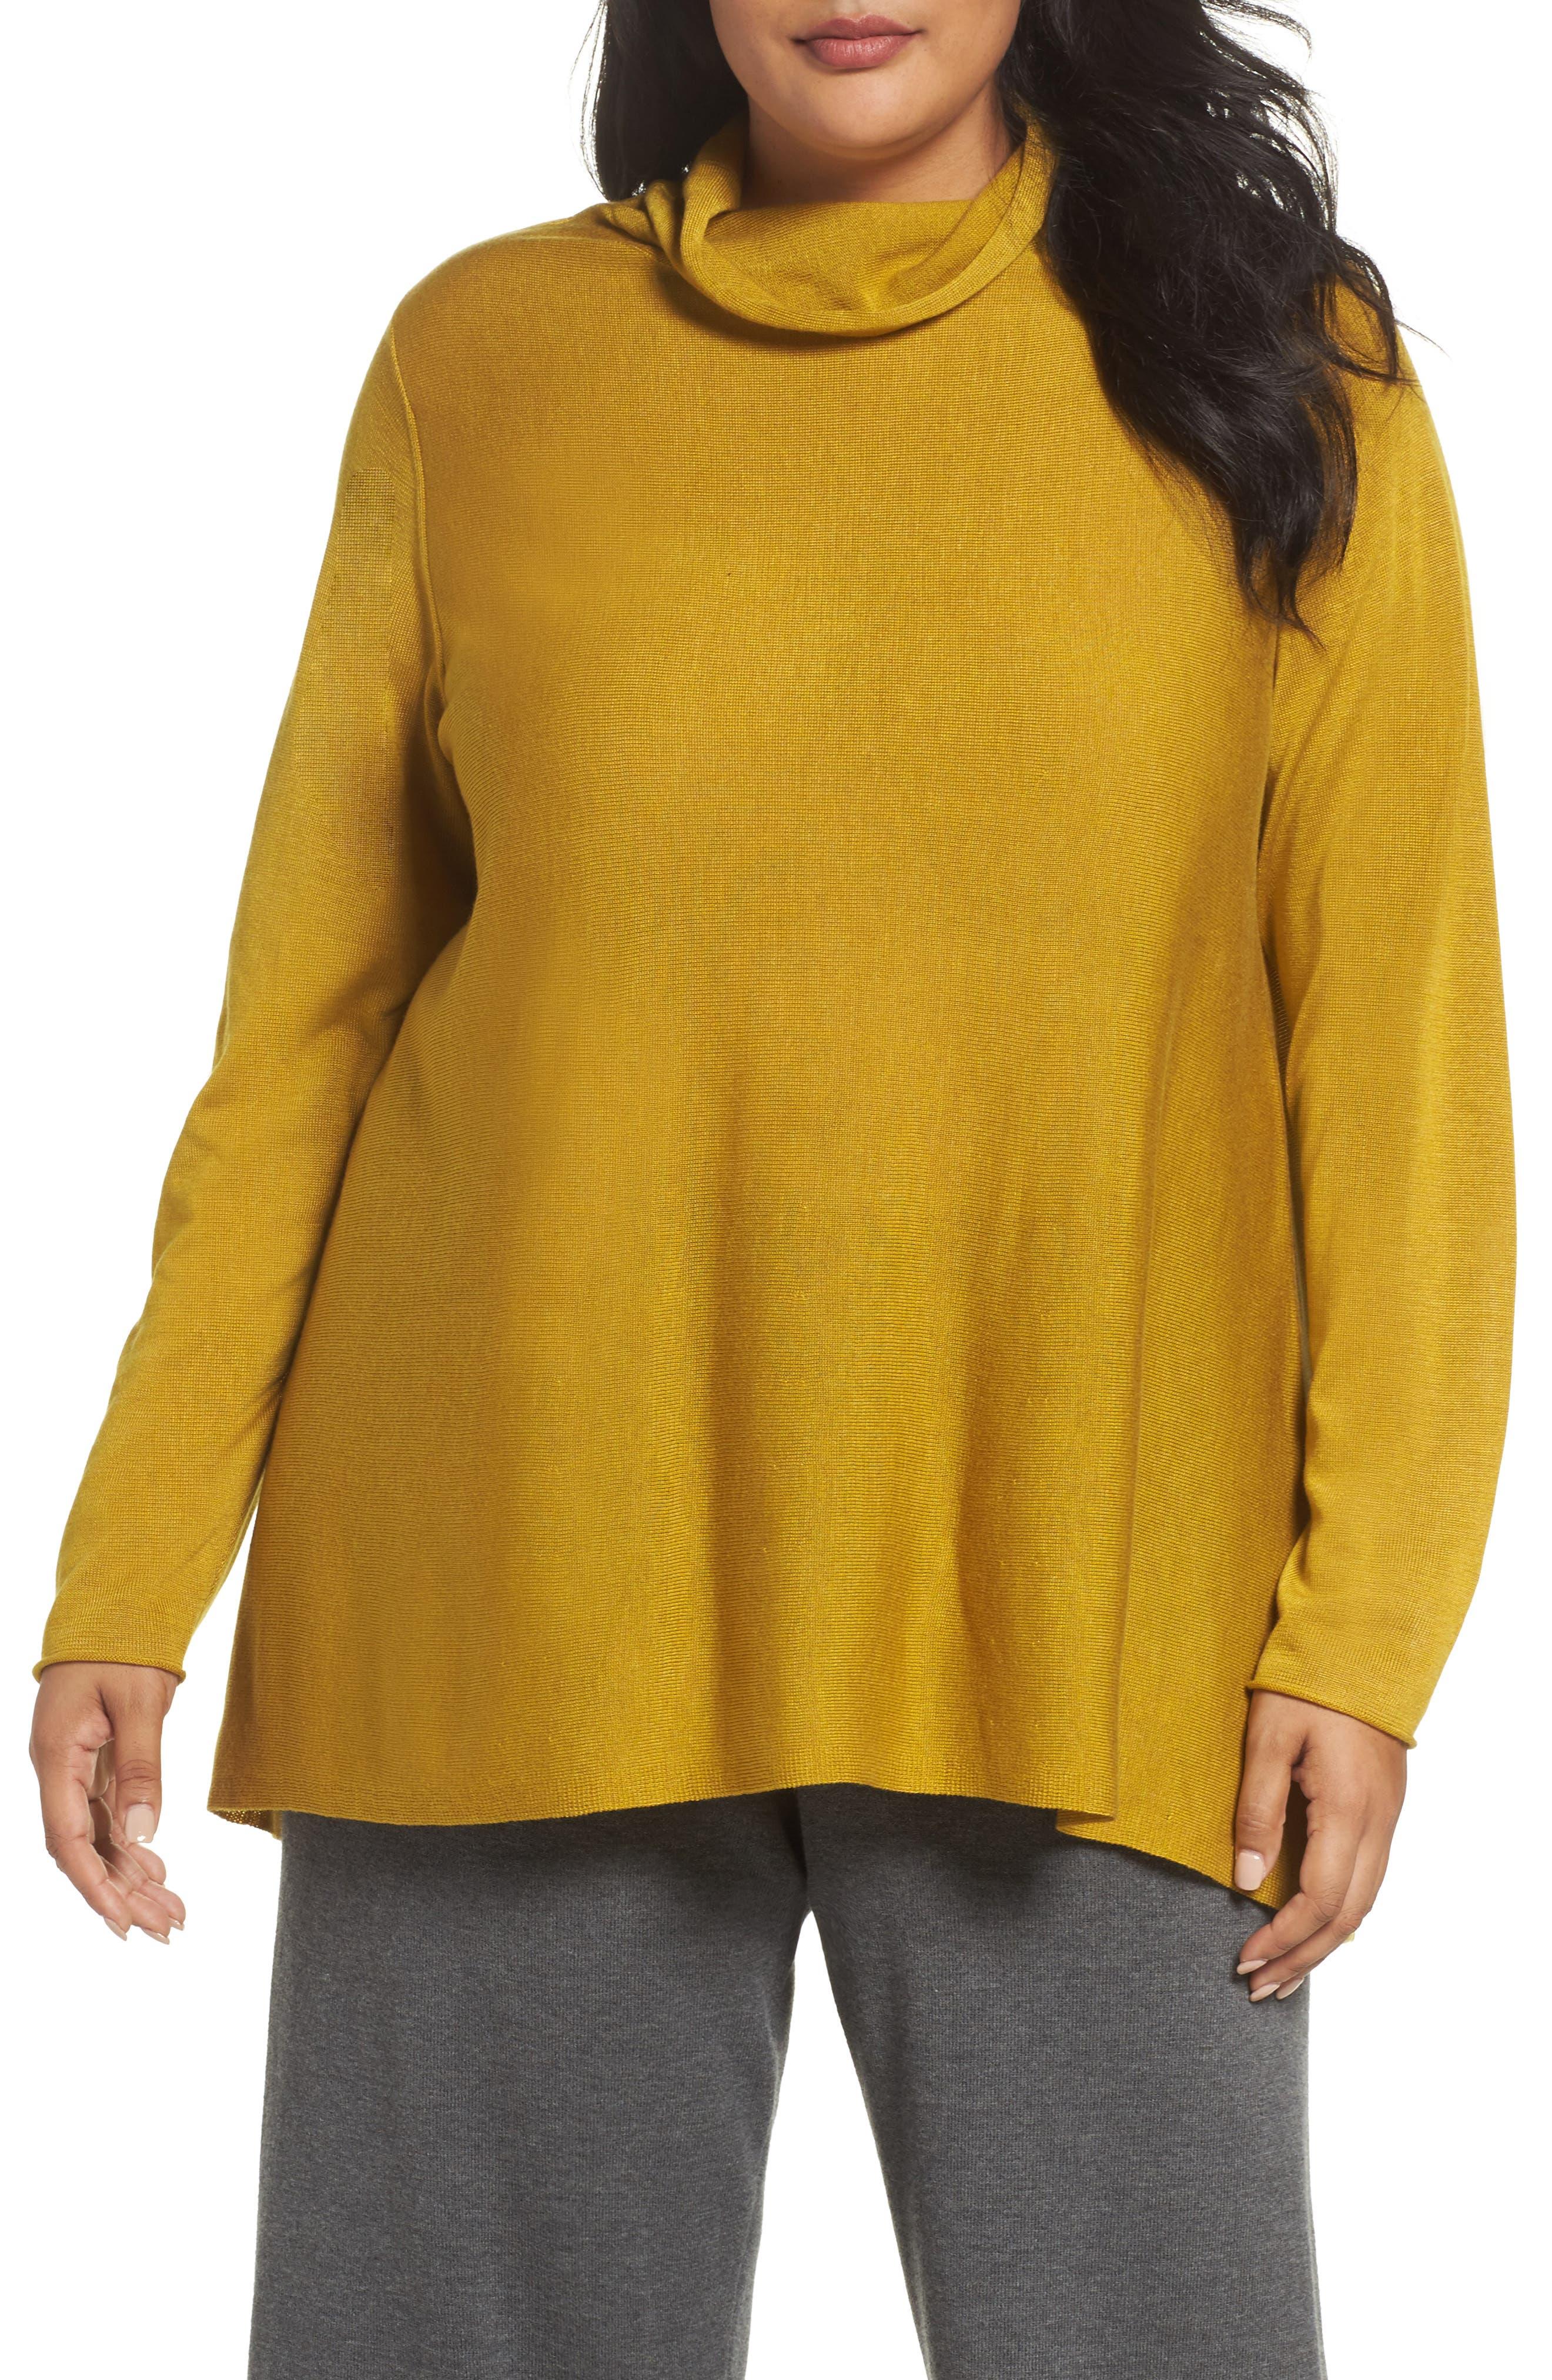 Main Image - Eileen Fisher Scrunch Turtleneck Sweater (Plus Size)